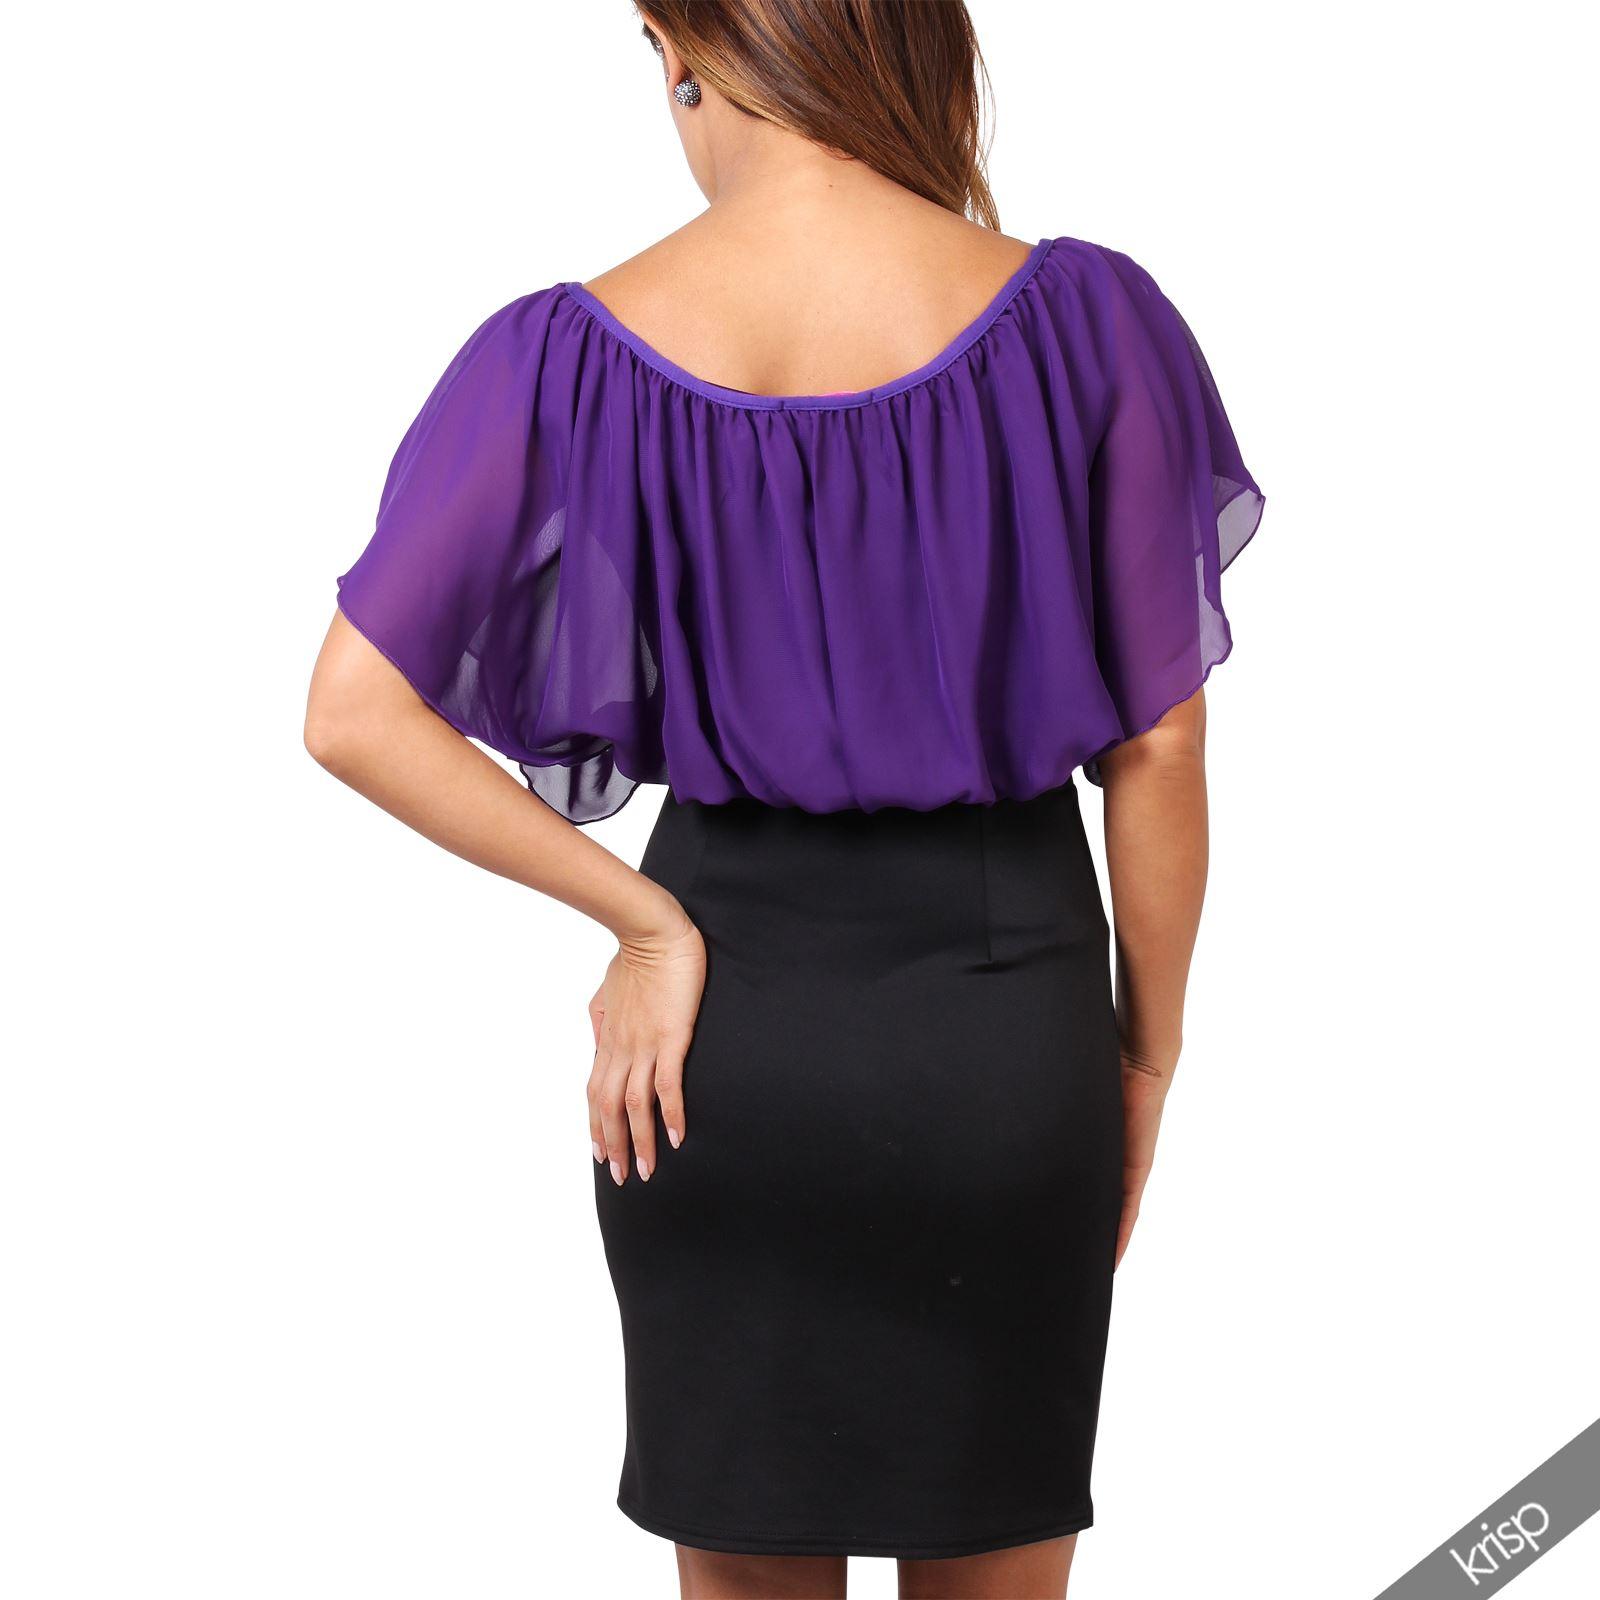 Womens-Pleated-Chiffon-Batwing-Top-High-Waist-Pencil-Bodycon-Skirt-Mini-Dress thumbnail 21